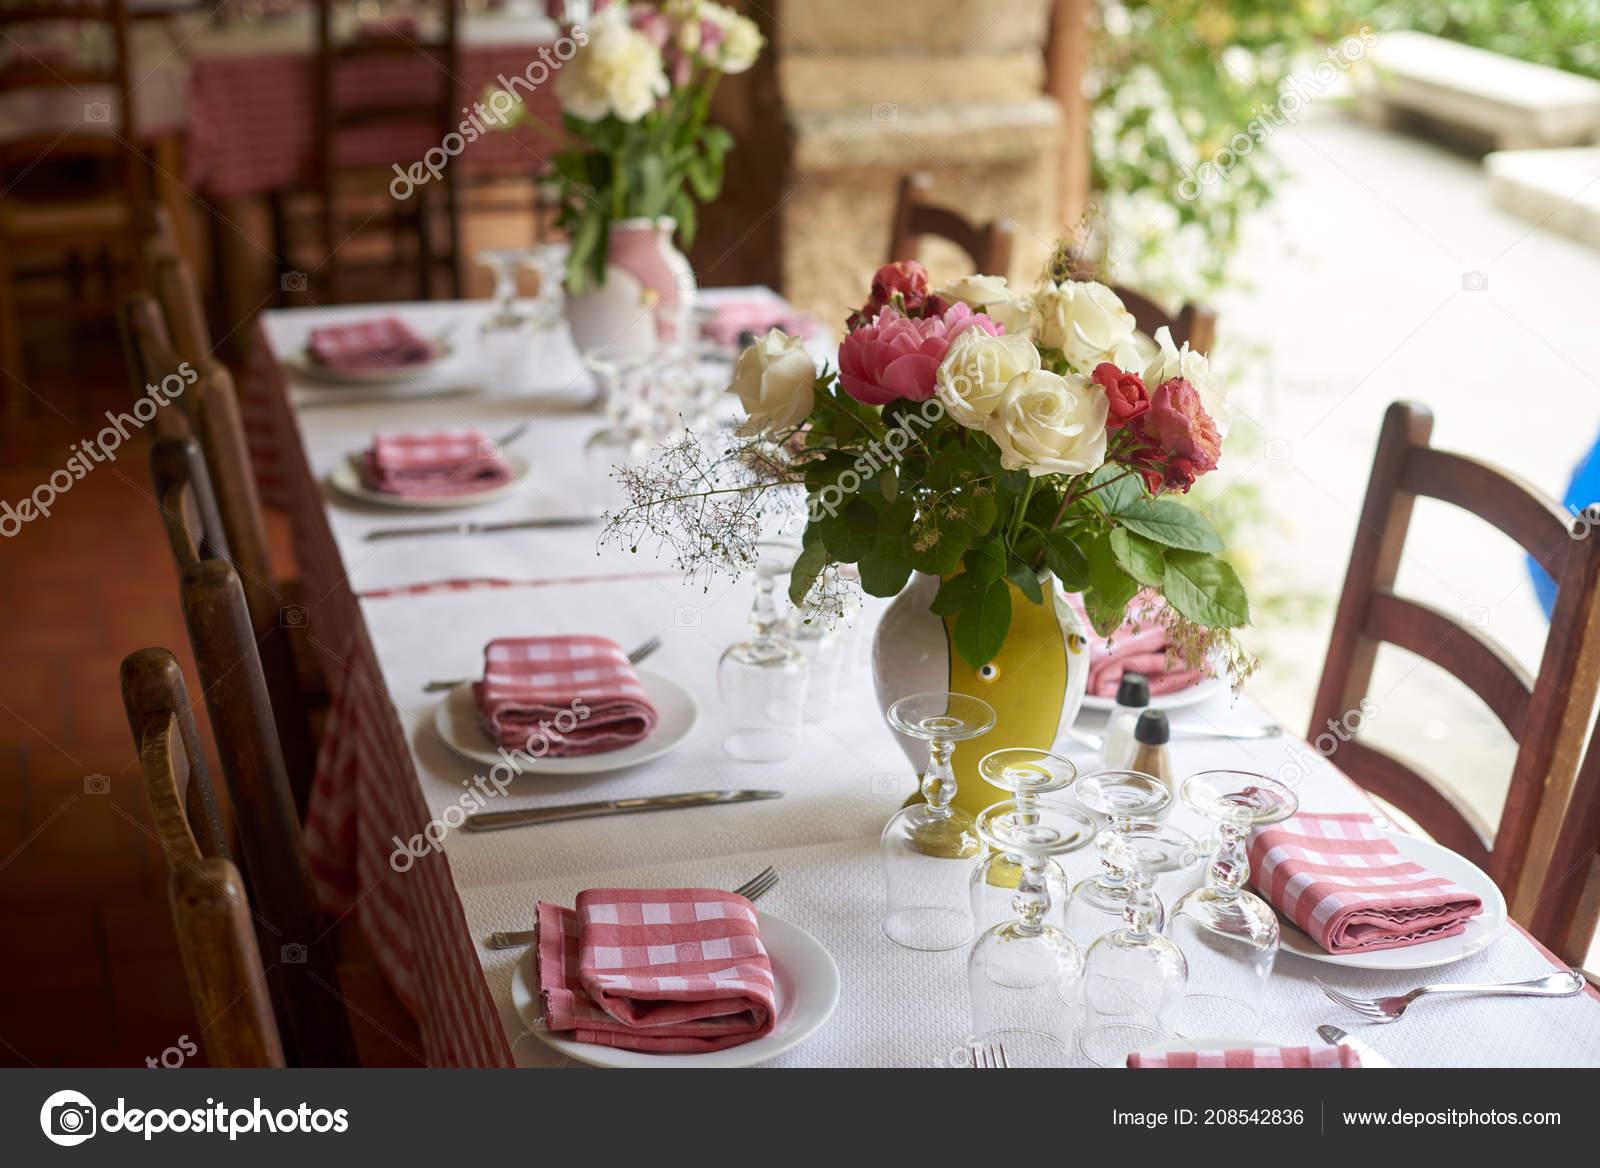 Shot Table Set Meal Restaurant Outdoor Terrace Stock Photo C Gzorgz 208542836